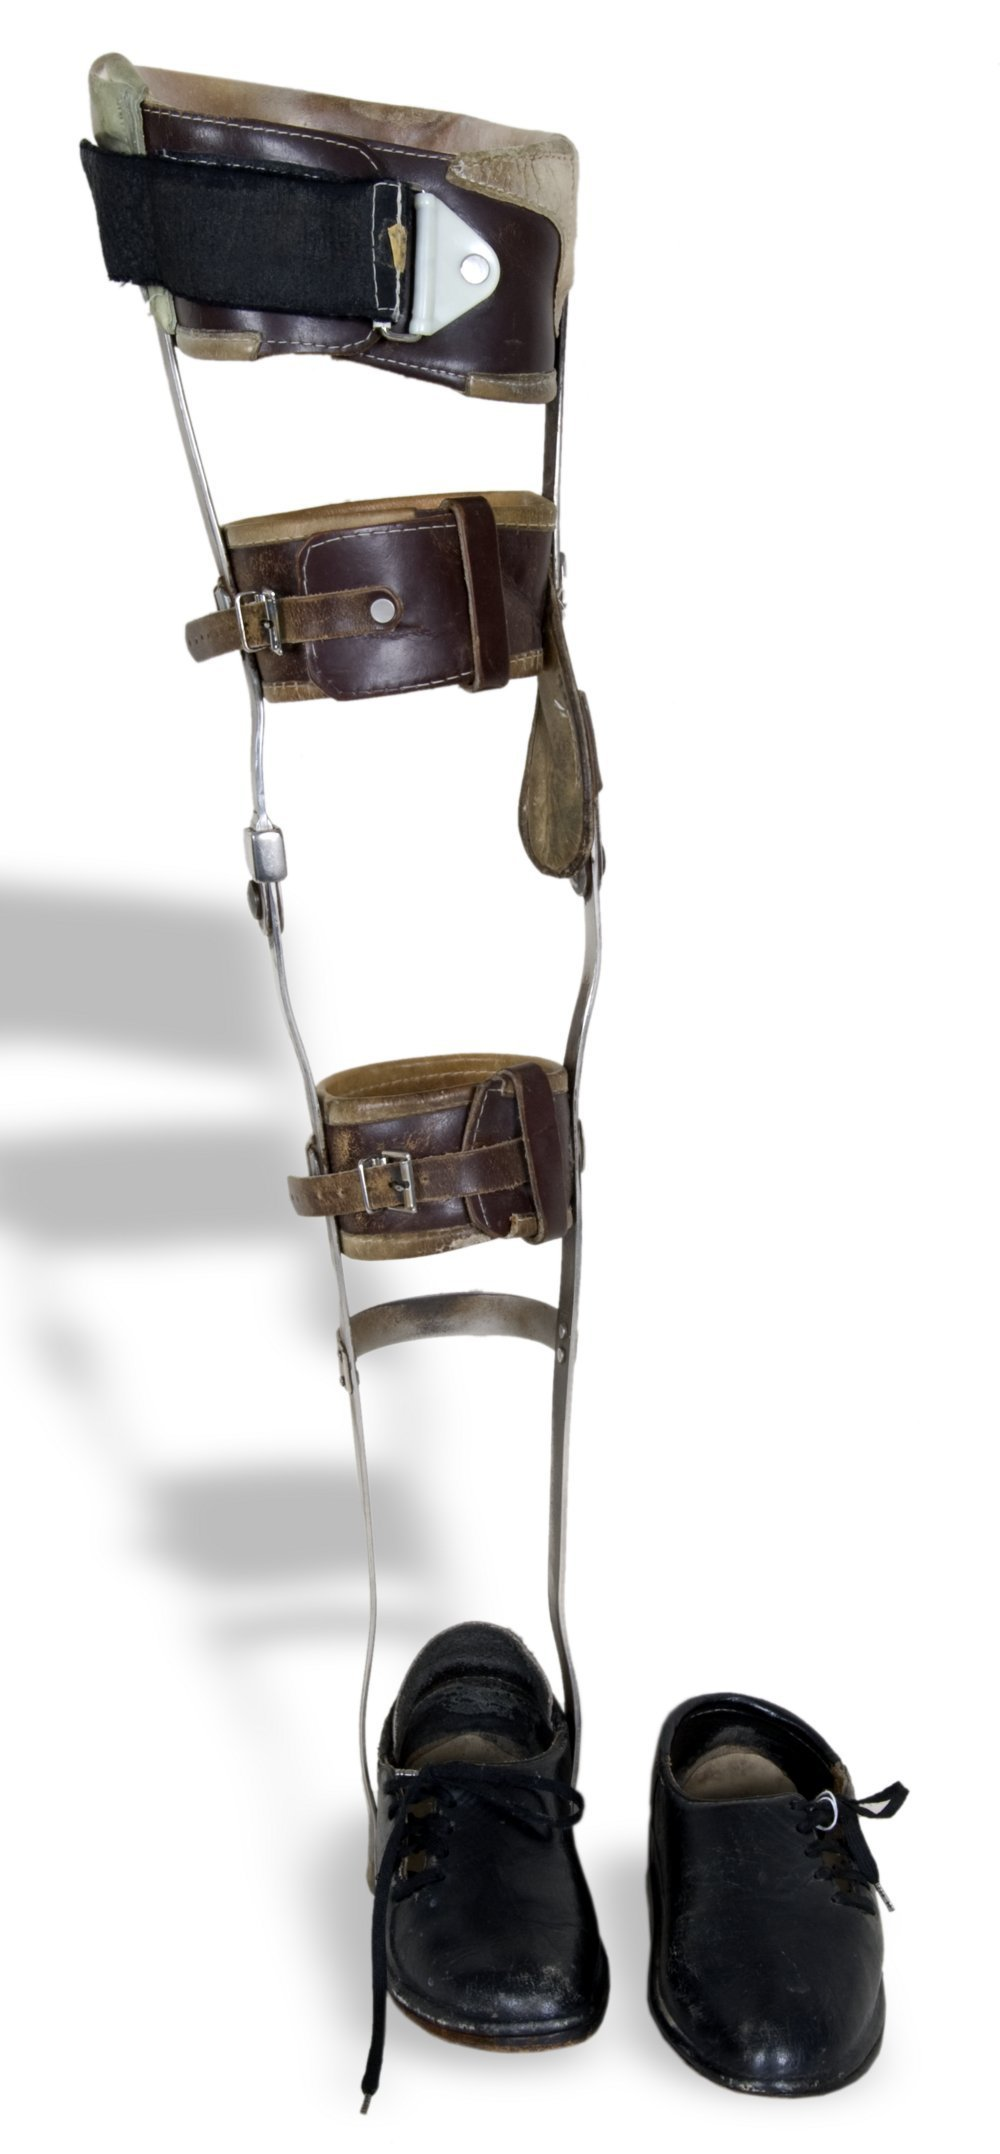 Leg brace